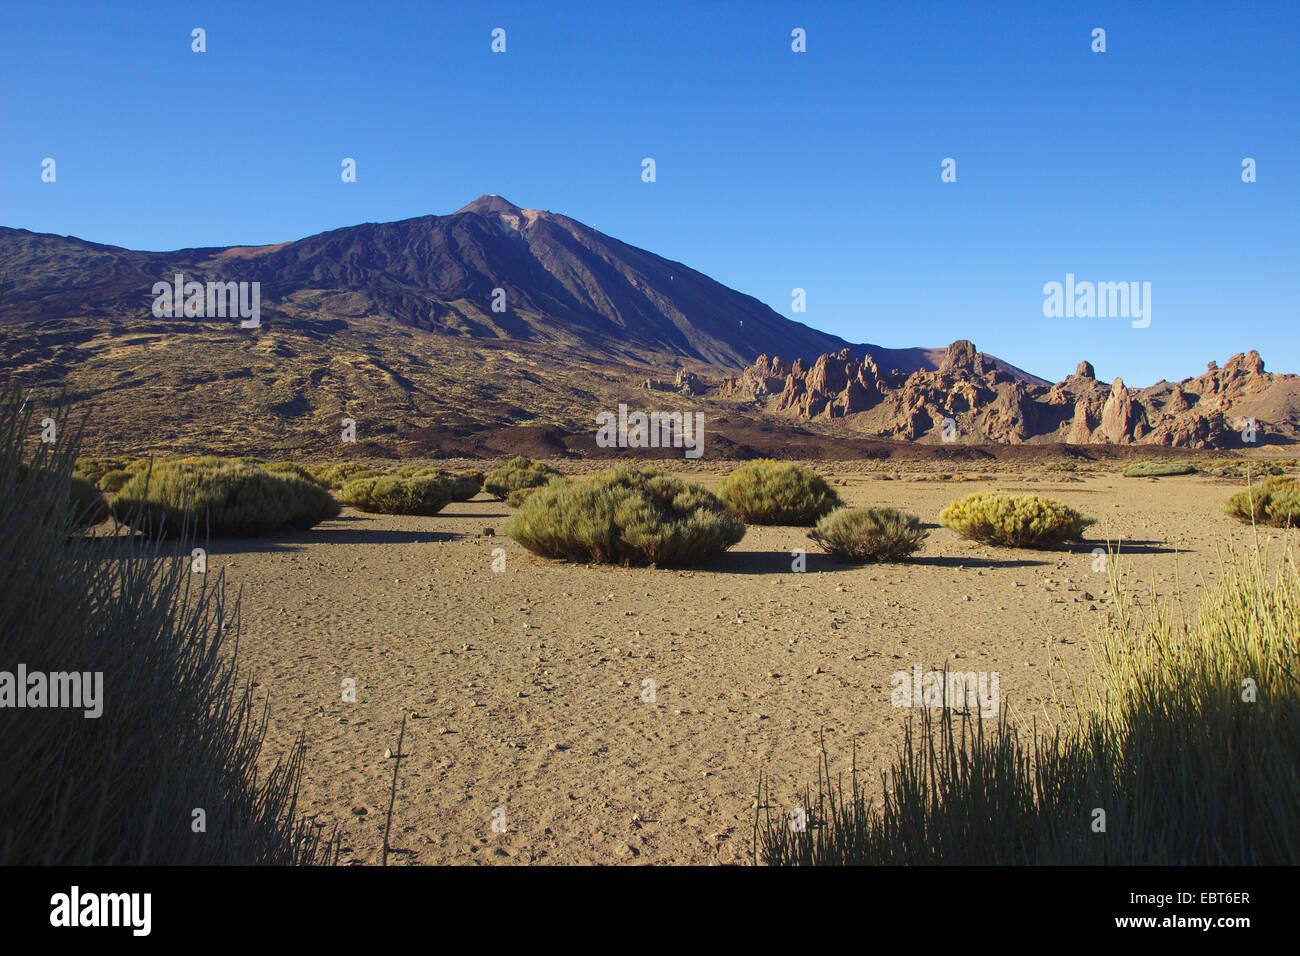 Llano de Ucanca with Teide volcano and Roques de Garcia, Ca�adas Caldera, Canary Islands, Tenerife, Teide National - Stock Image